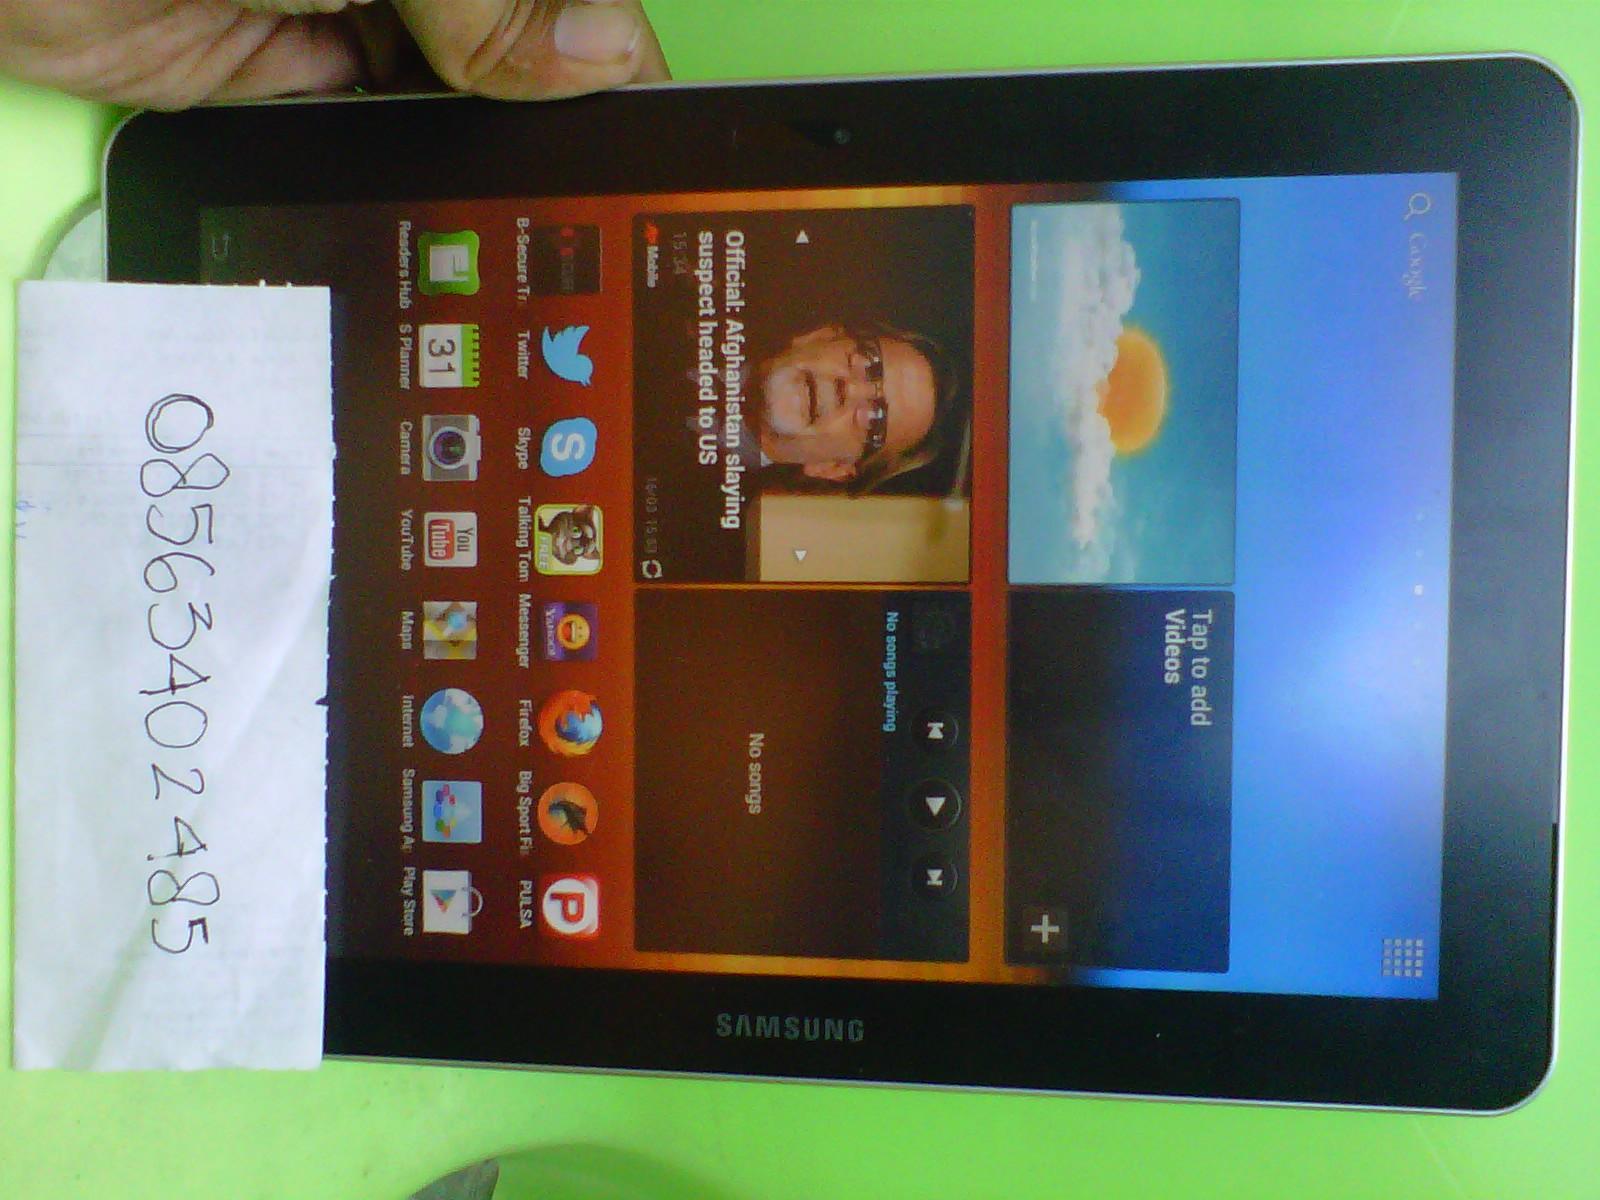 Samsung Galaxy Tab Gt P7500 101 Inch 3g 16gb Mulus Surabaya Handphone Cod Bungurasih